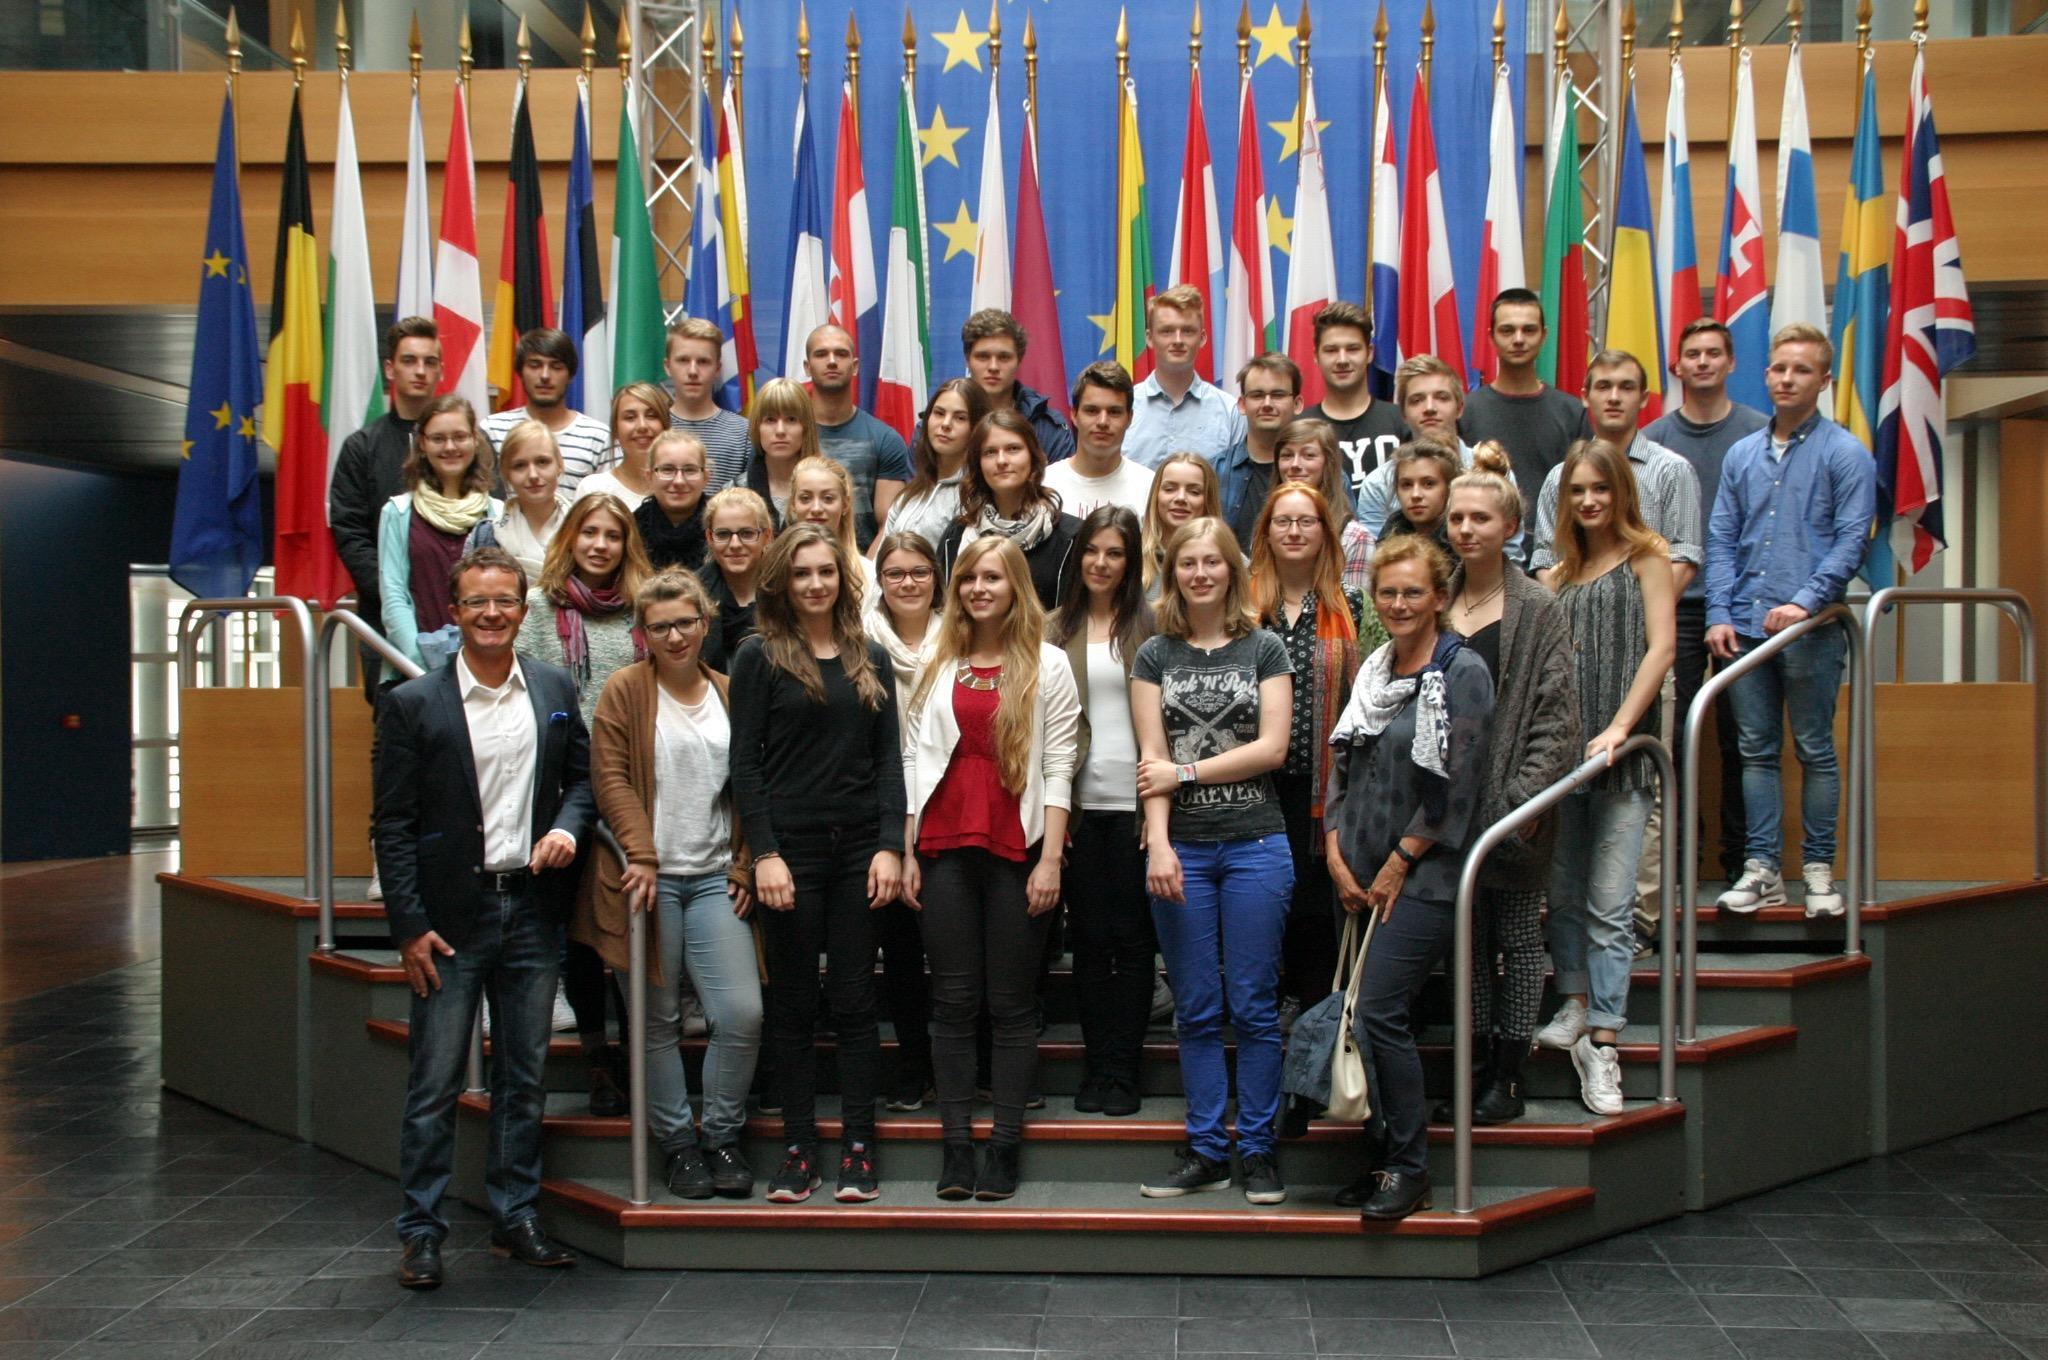 Unsere Gruppe Straßburg <a href=http://www.igsjena.de/content/file/Studienfahrt2015.jpg target=_blank class=link>Link</a>